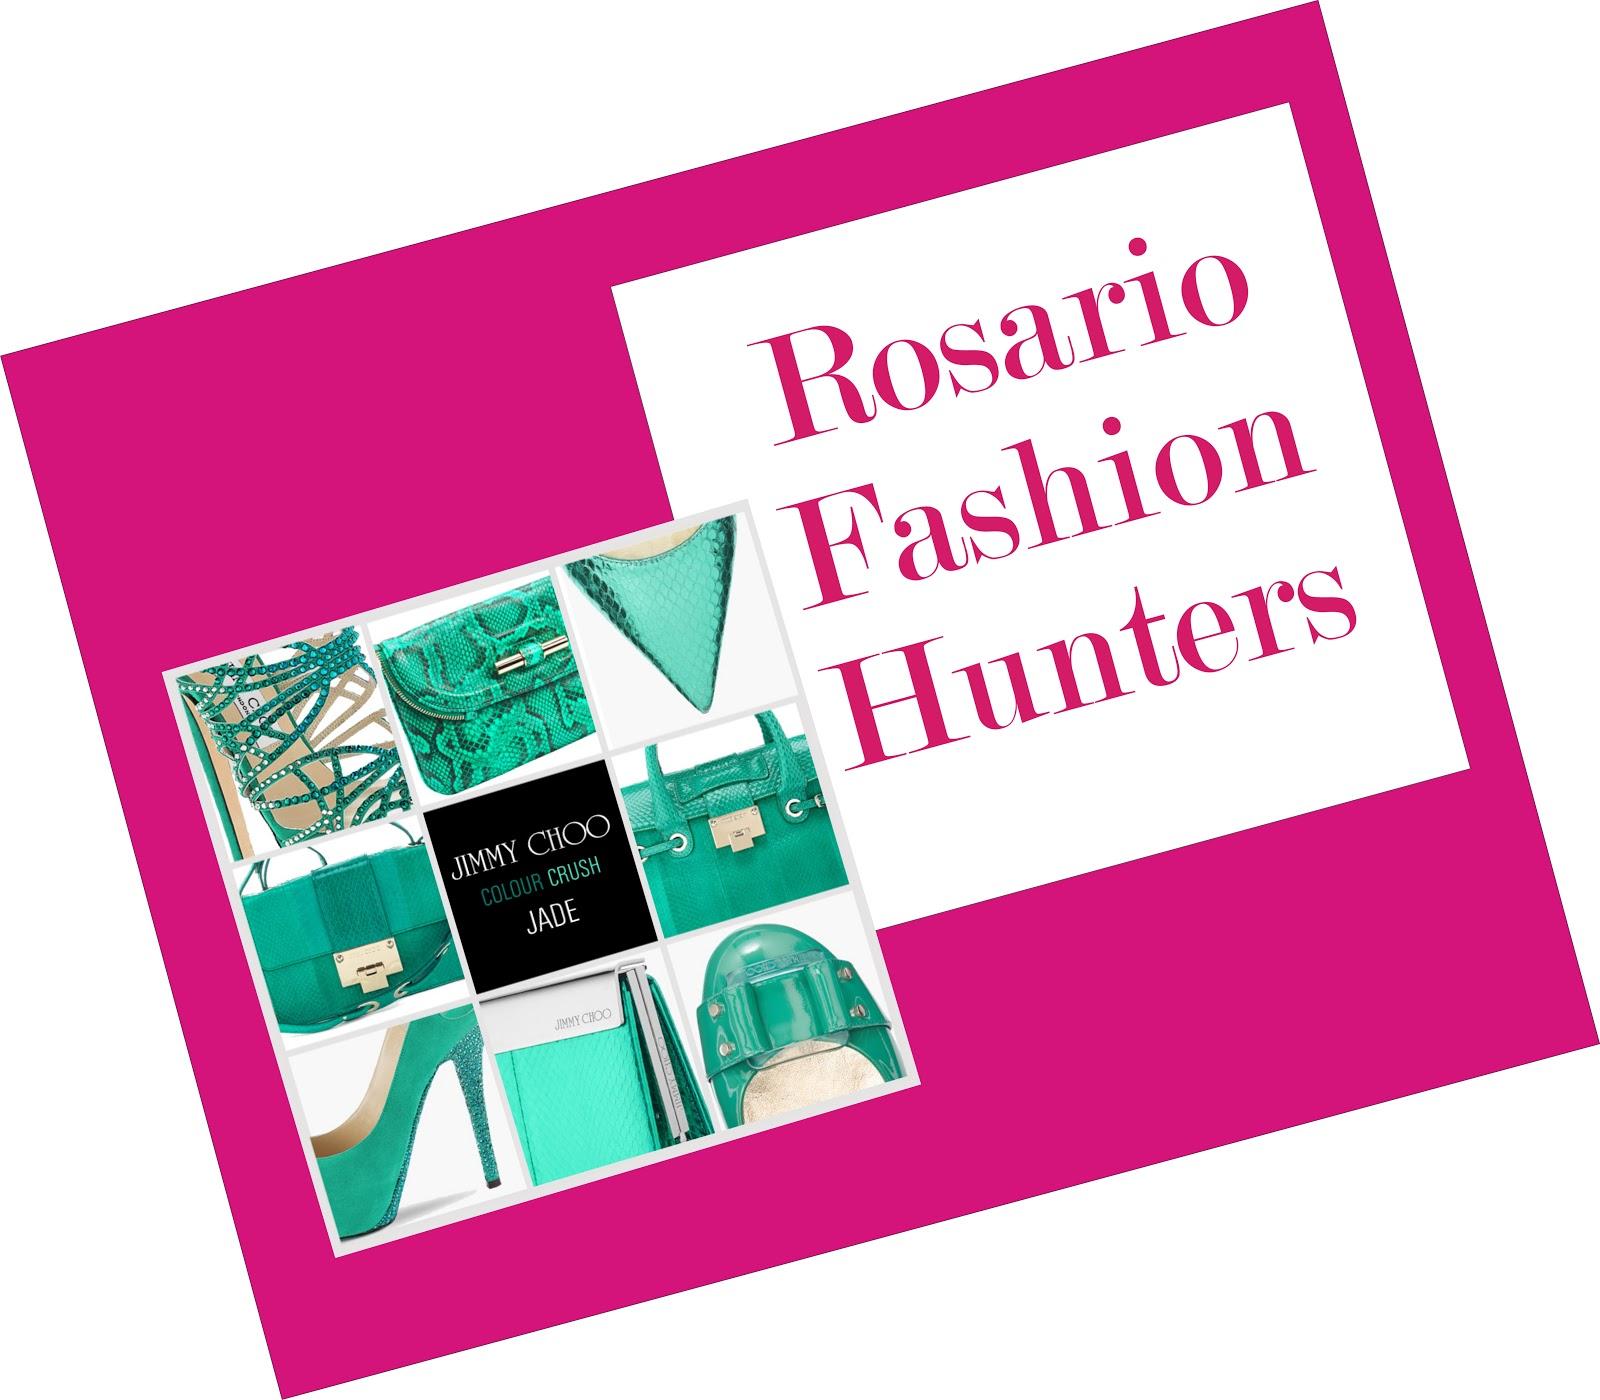 Rosario Fashion Hunters 20121104